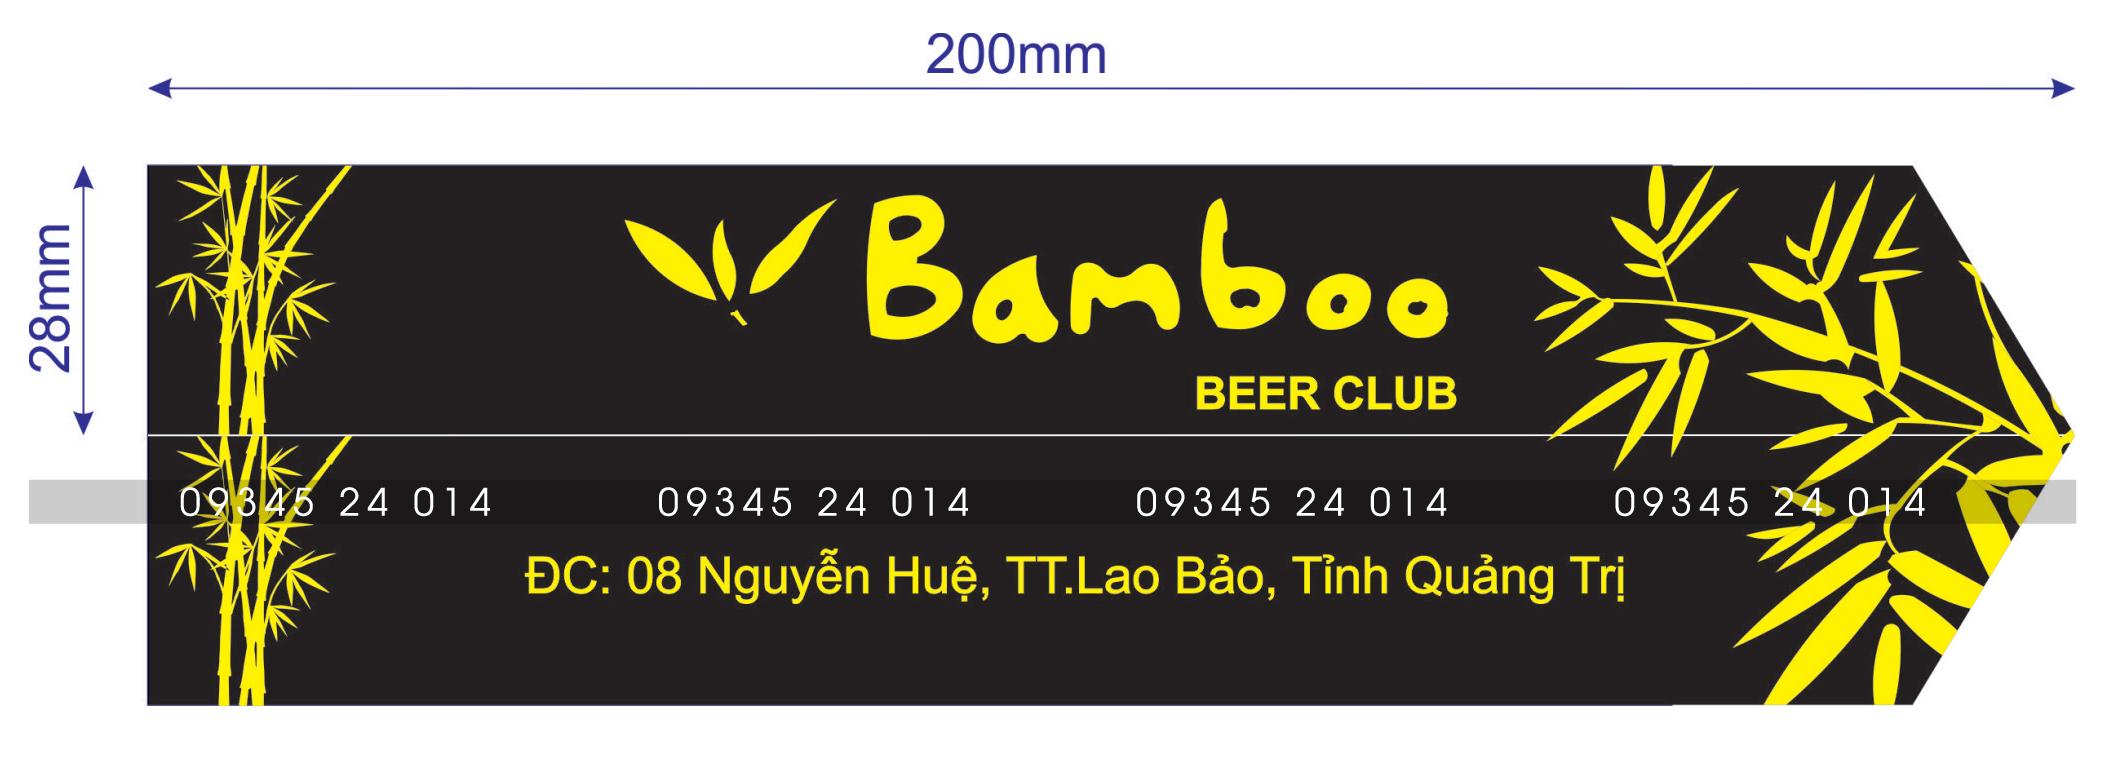 Bamboo-beer club